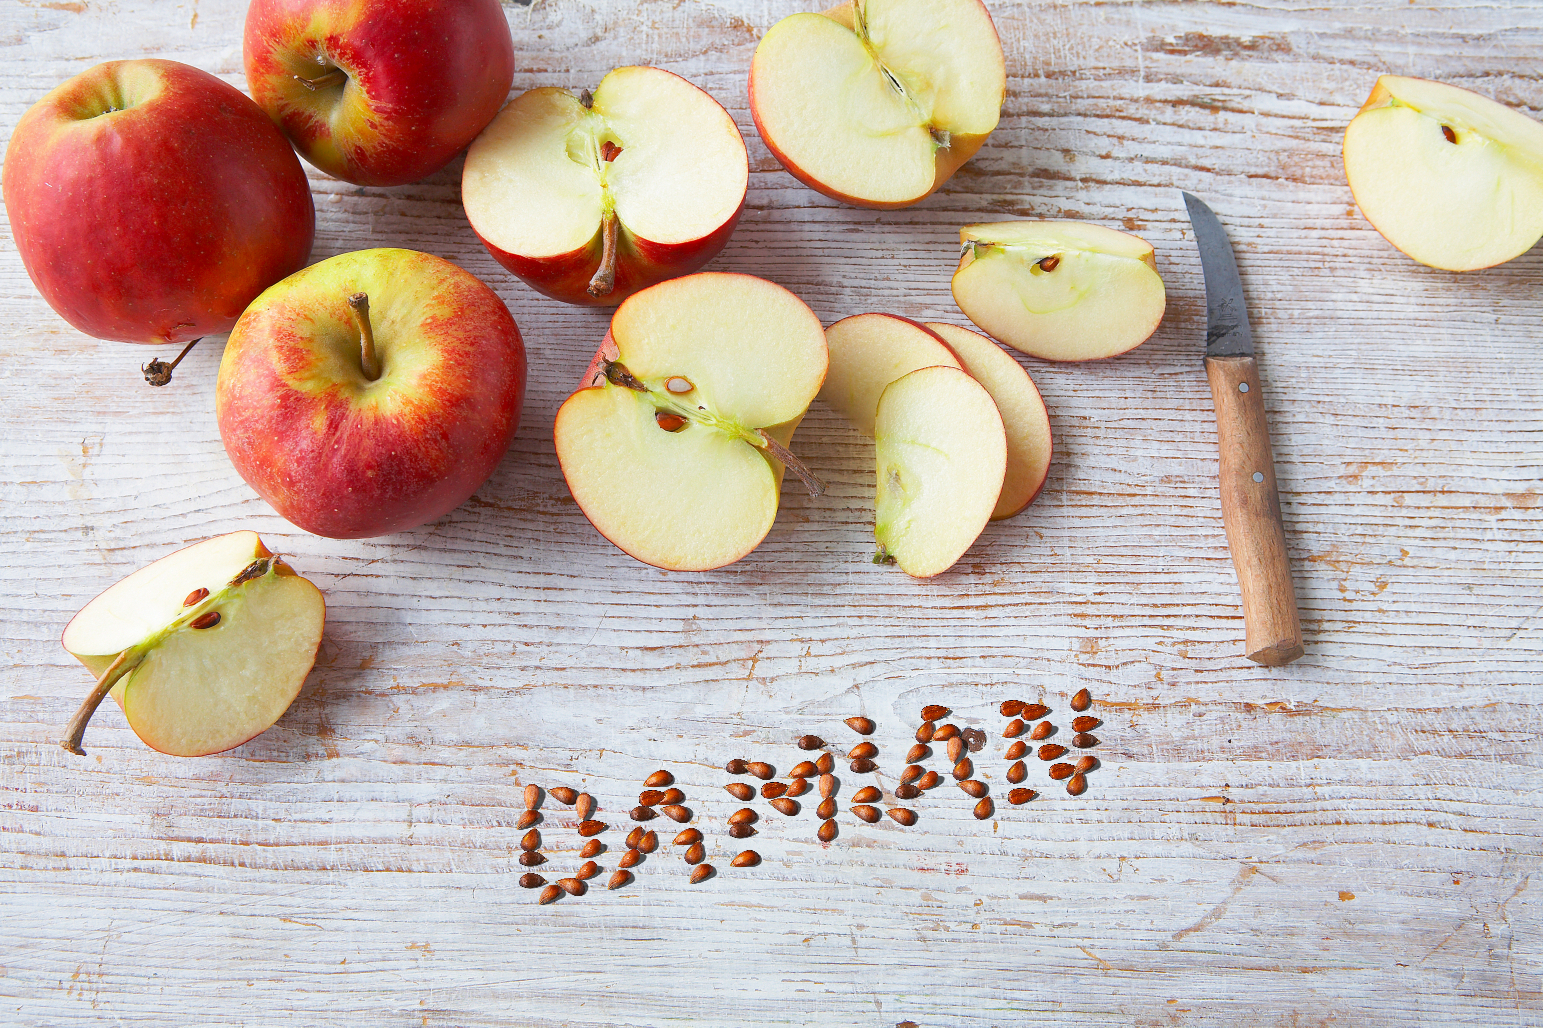 Apples - PAM339